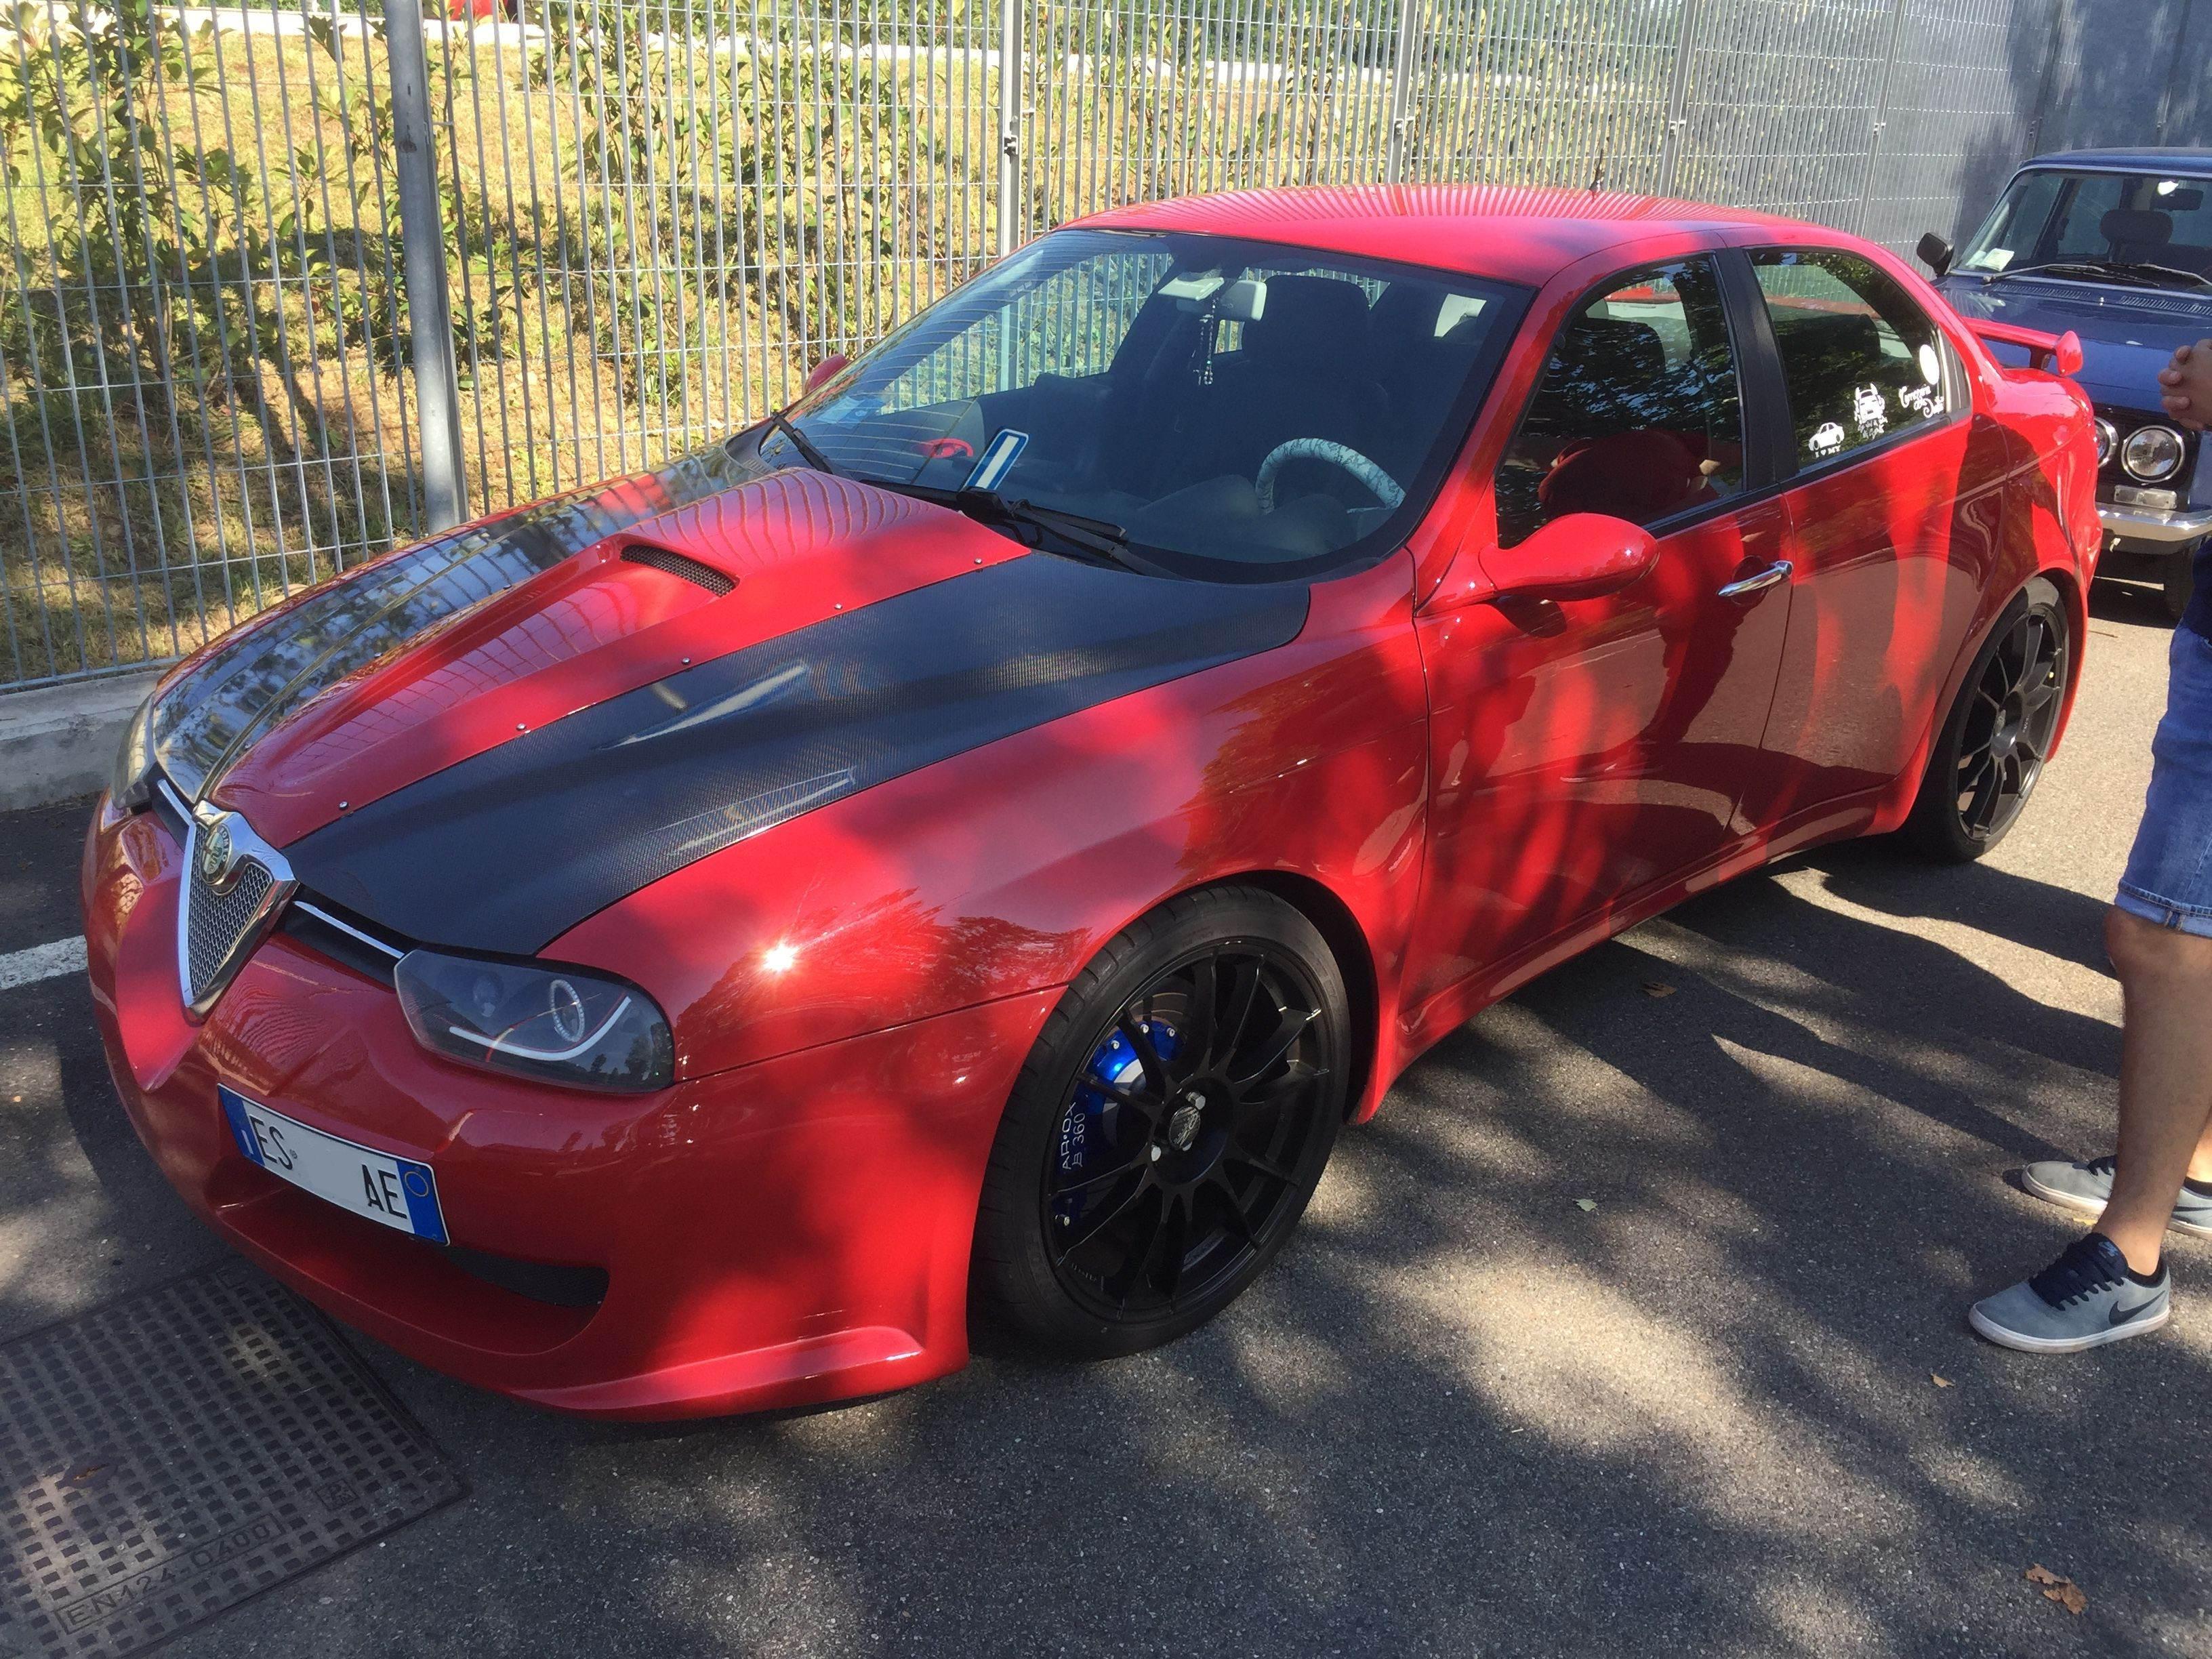 foto Alfa Romeo day 2019 - 5